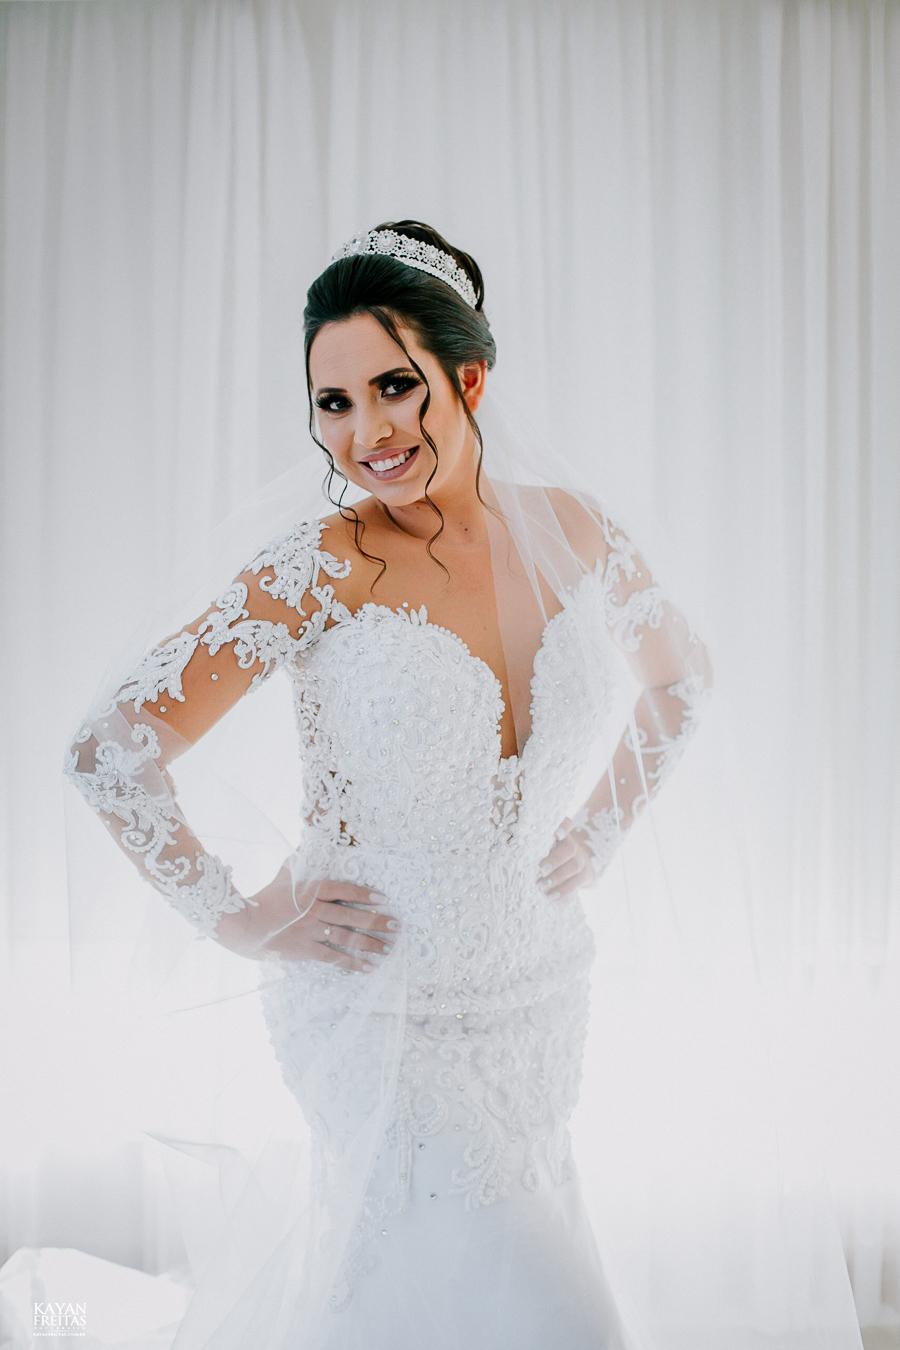 casamento-paularamos-florianopolis-0037 Casamento Cris e Mickael - Paula Ramos Florianópolis